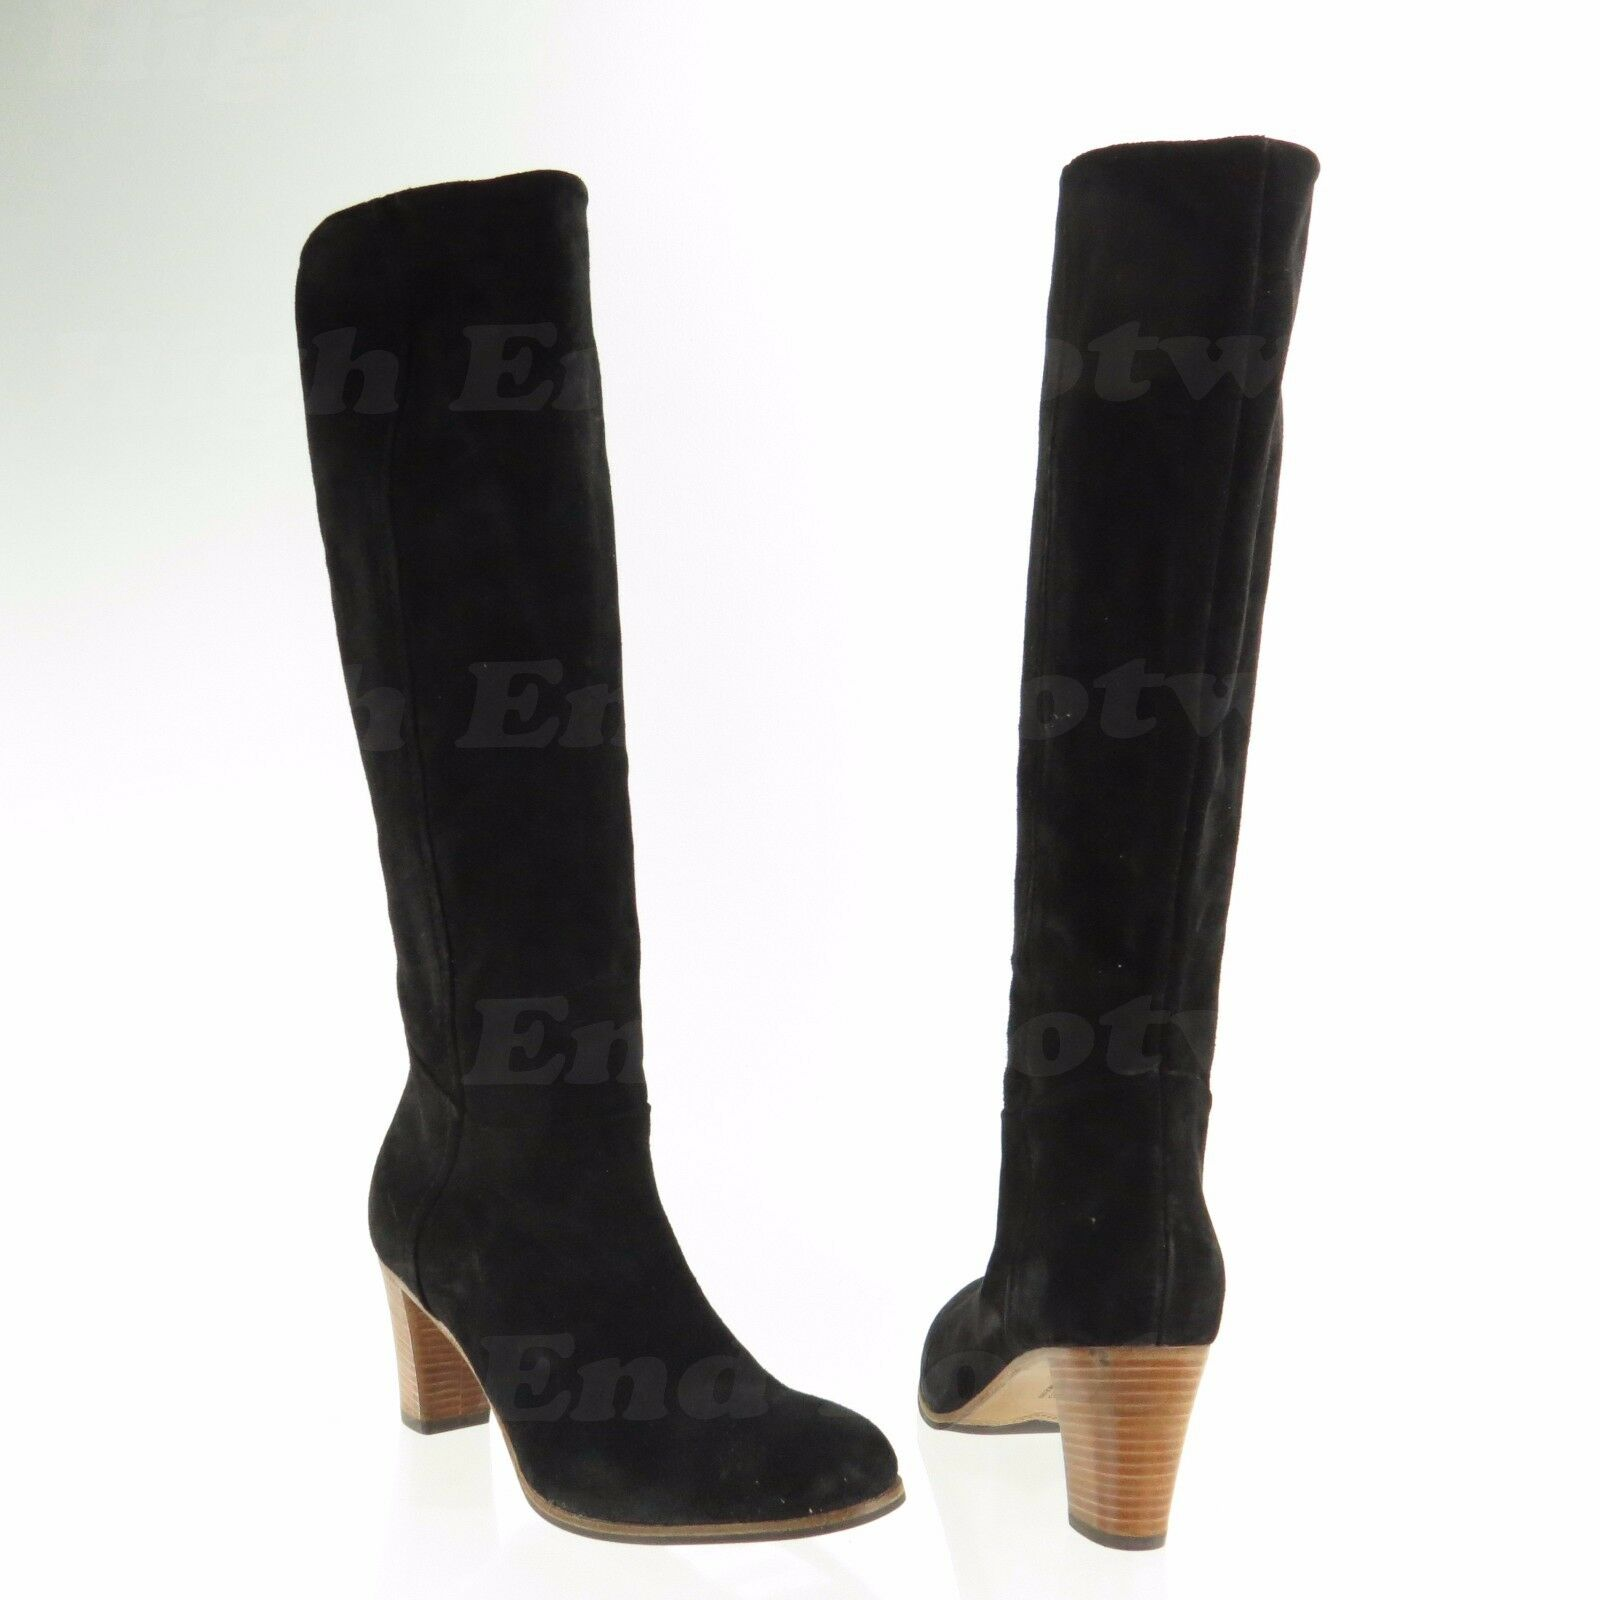 Alberto Fermani Savona Womens Shoes Black Suede Knee High Boots Sz 38.5 NEW $575